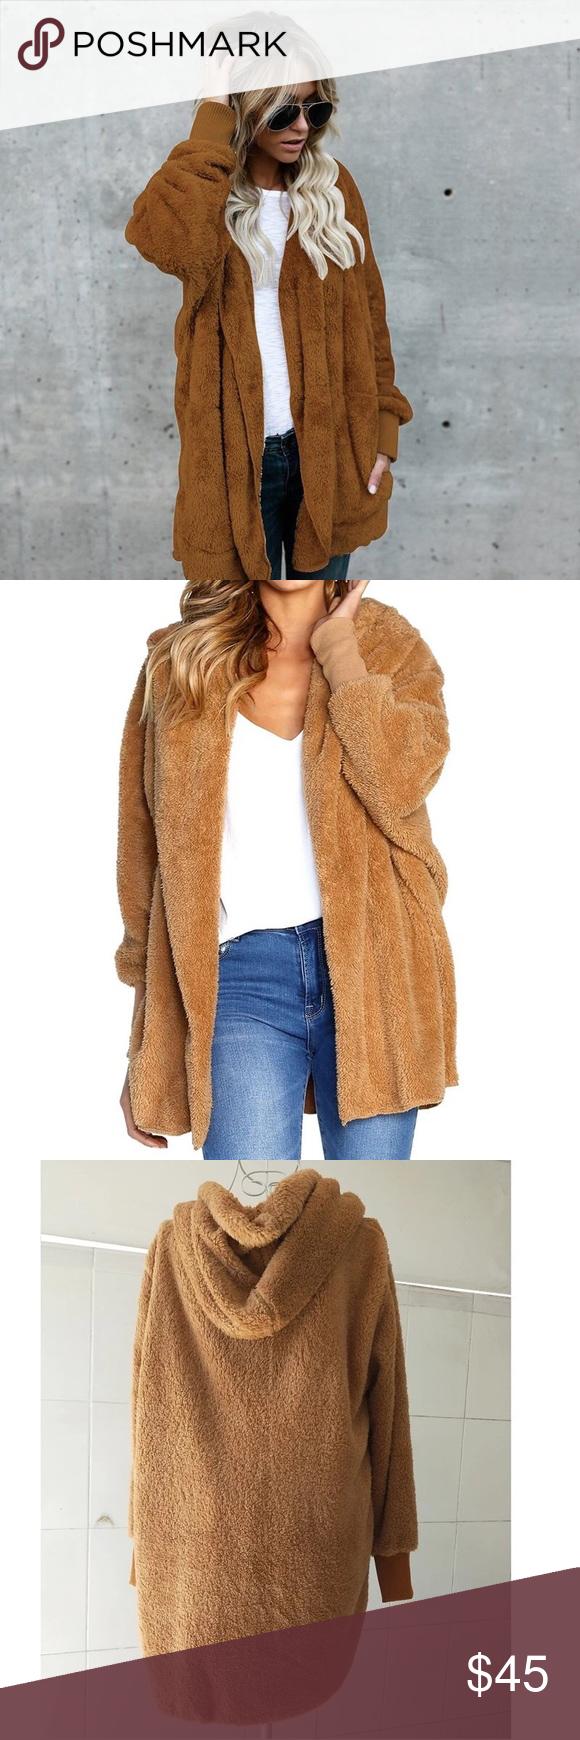 fa8f90067 Teddy bear fuzzy Sherpa hoodie jacket coat Never worn brand new This ...